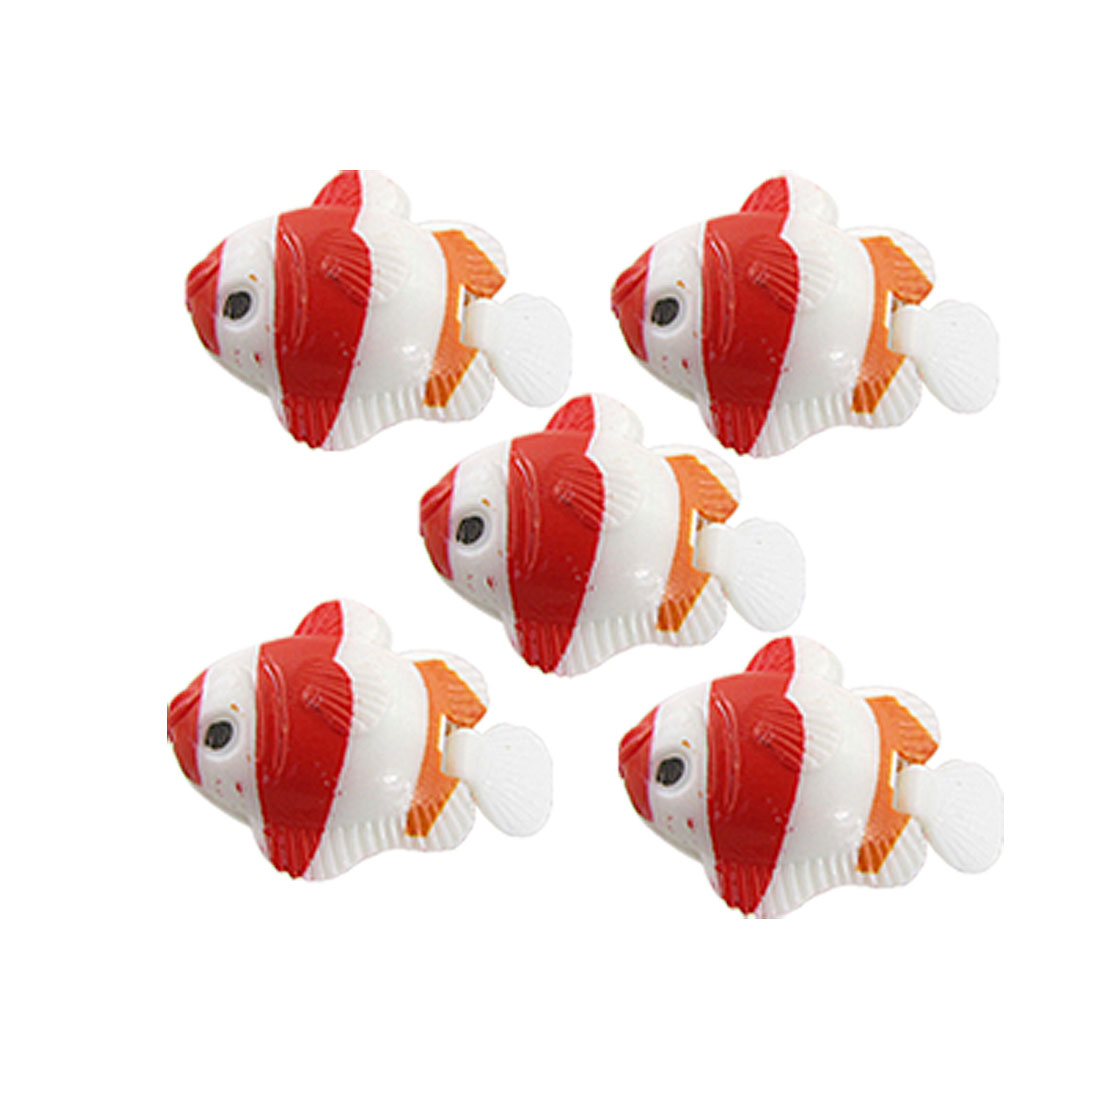 5 PCS Aquarium Plastic Floating Fish Tank Ornamental Fish